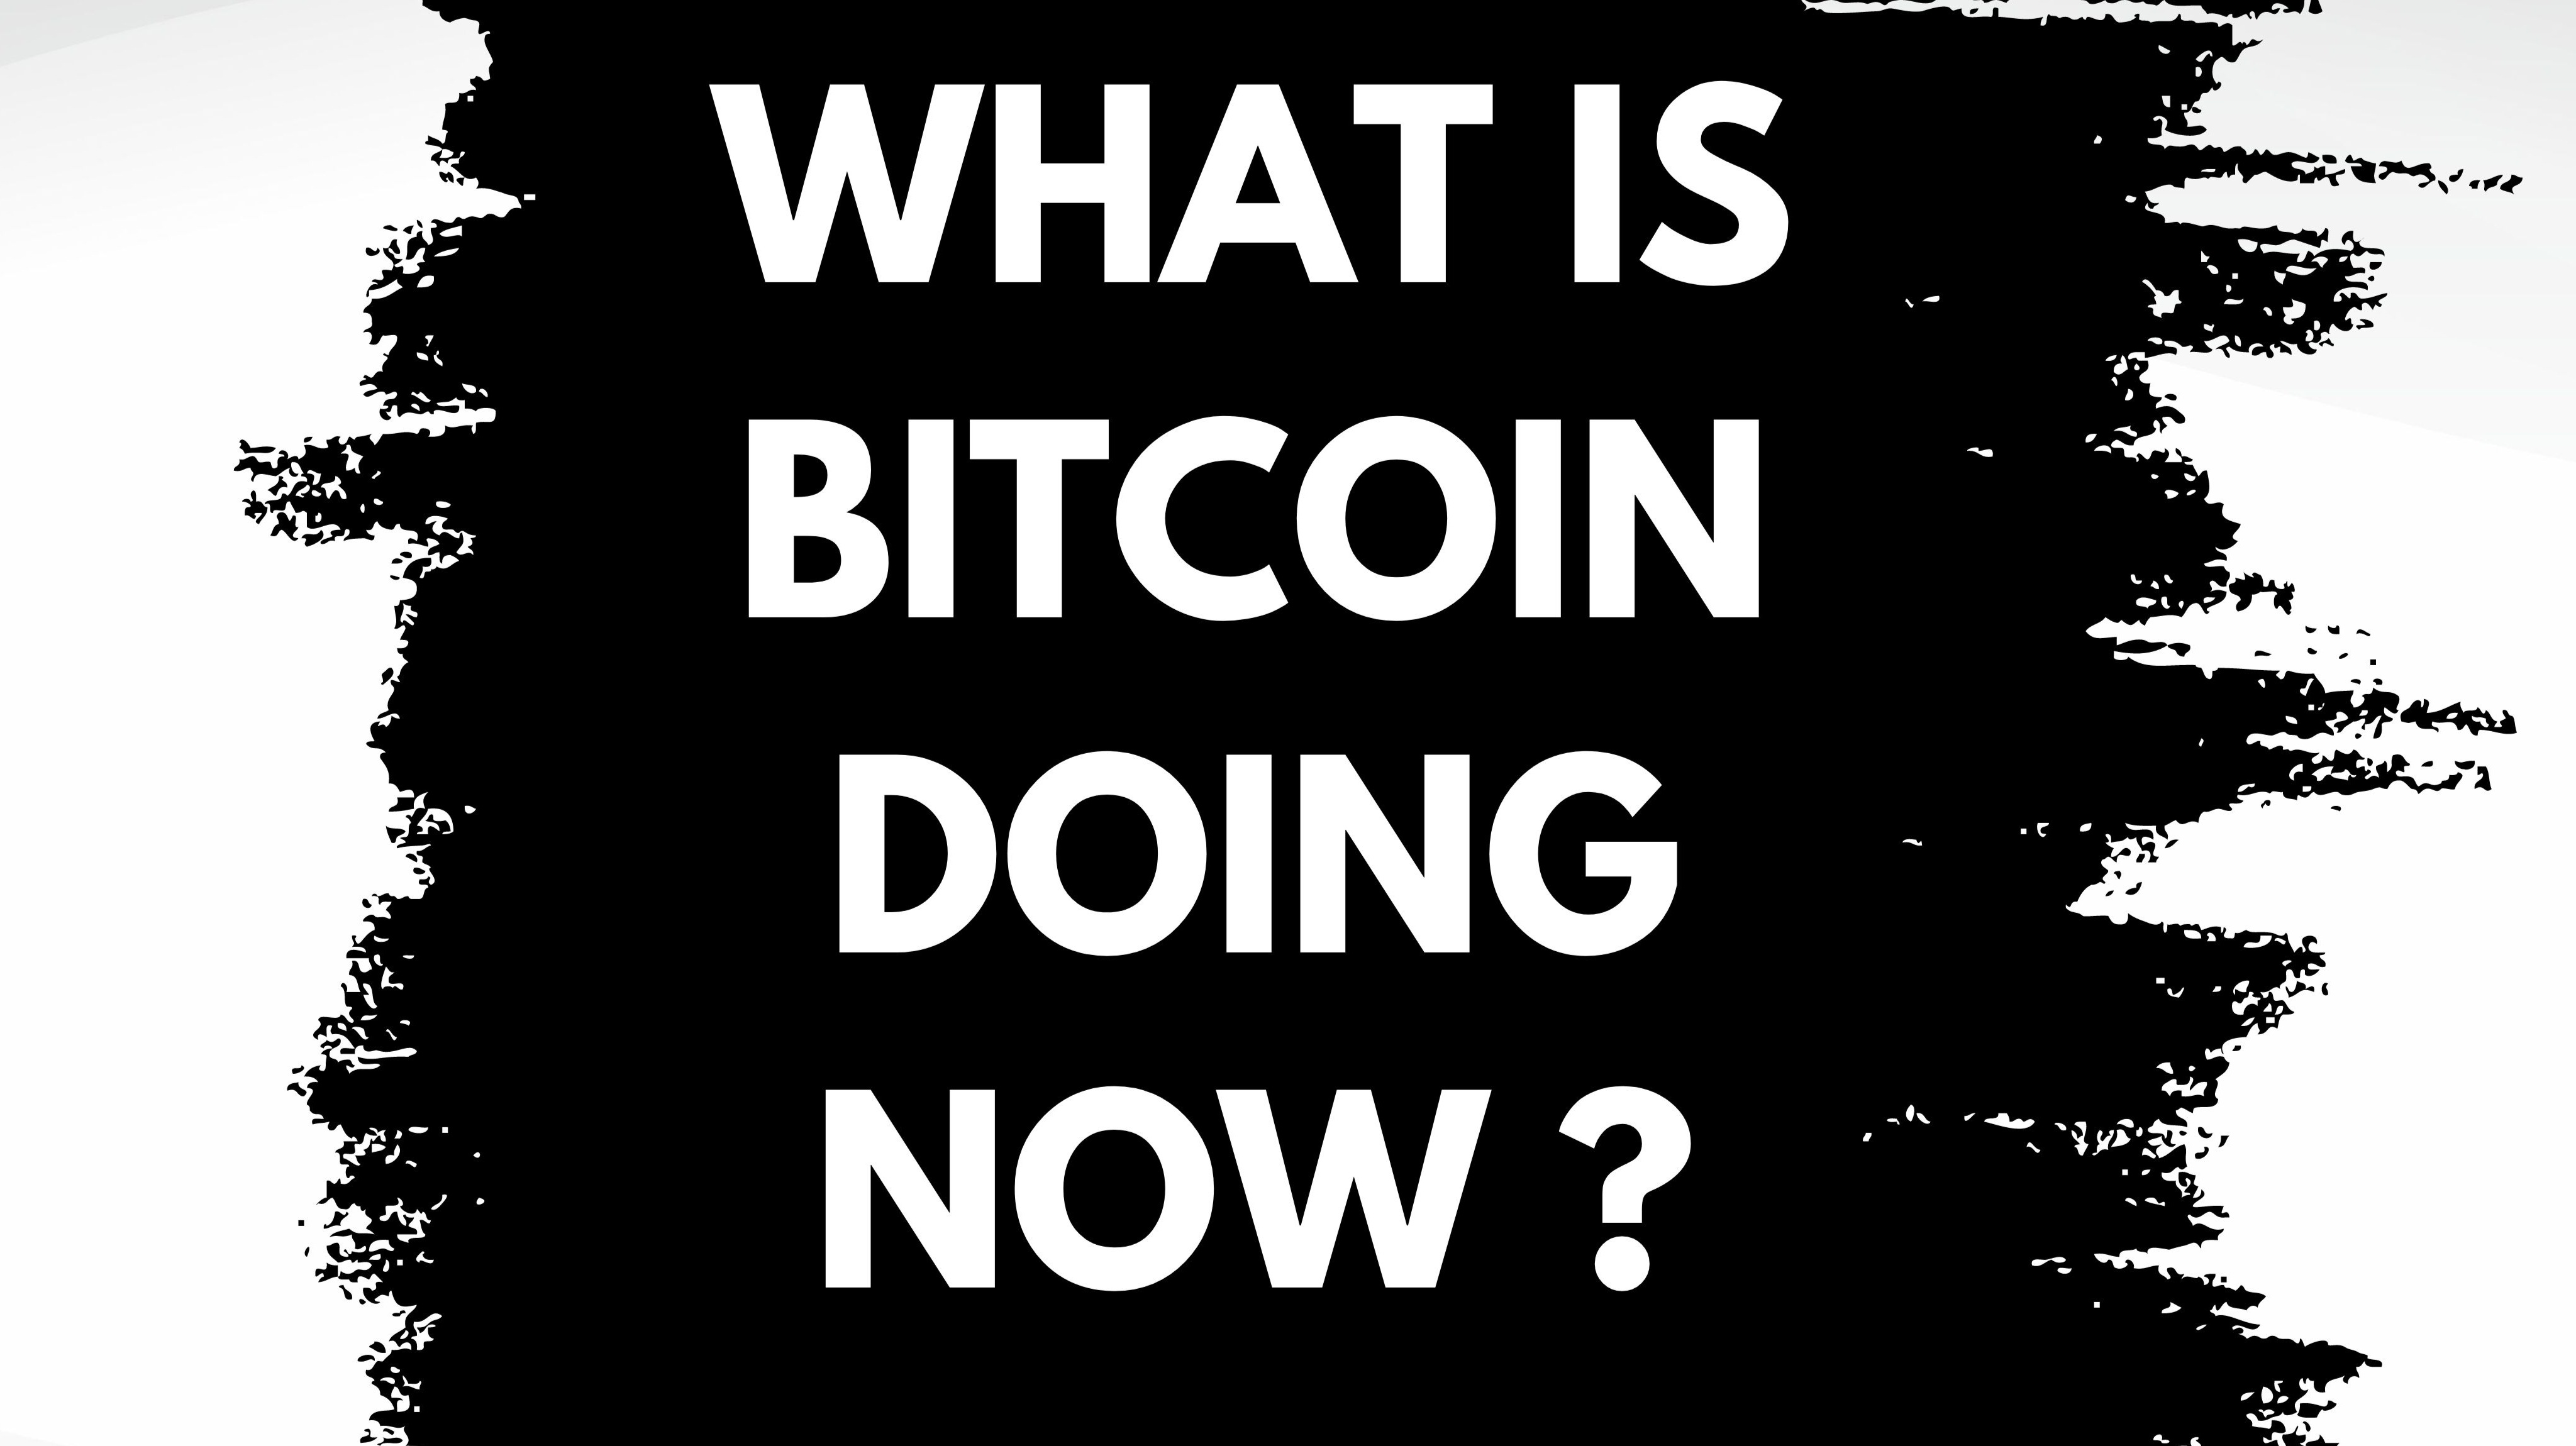 Bitcoin being naughty again ?